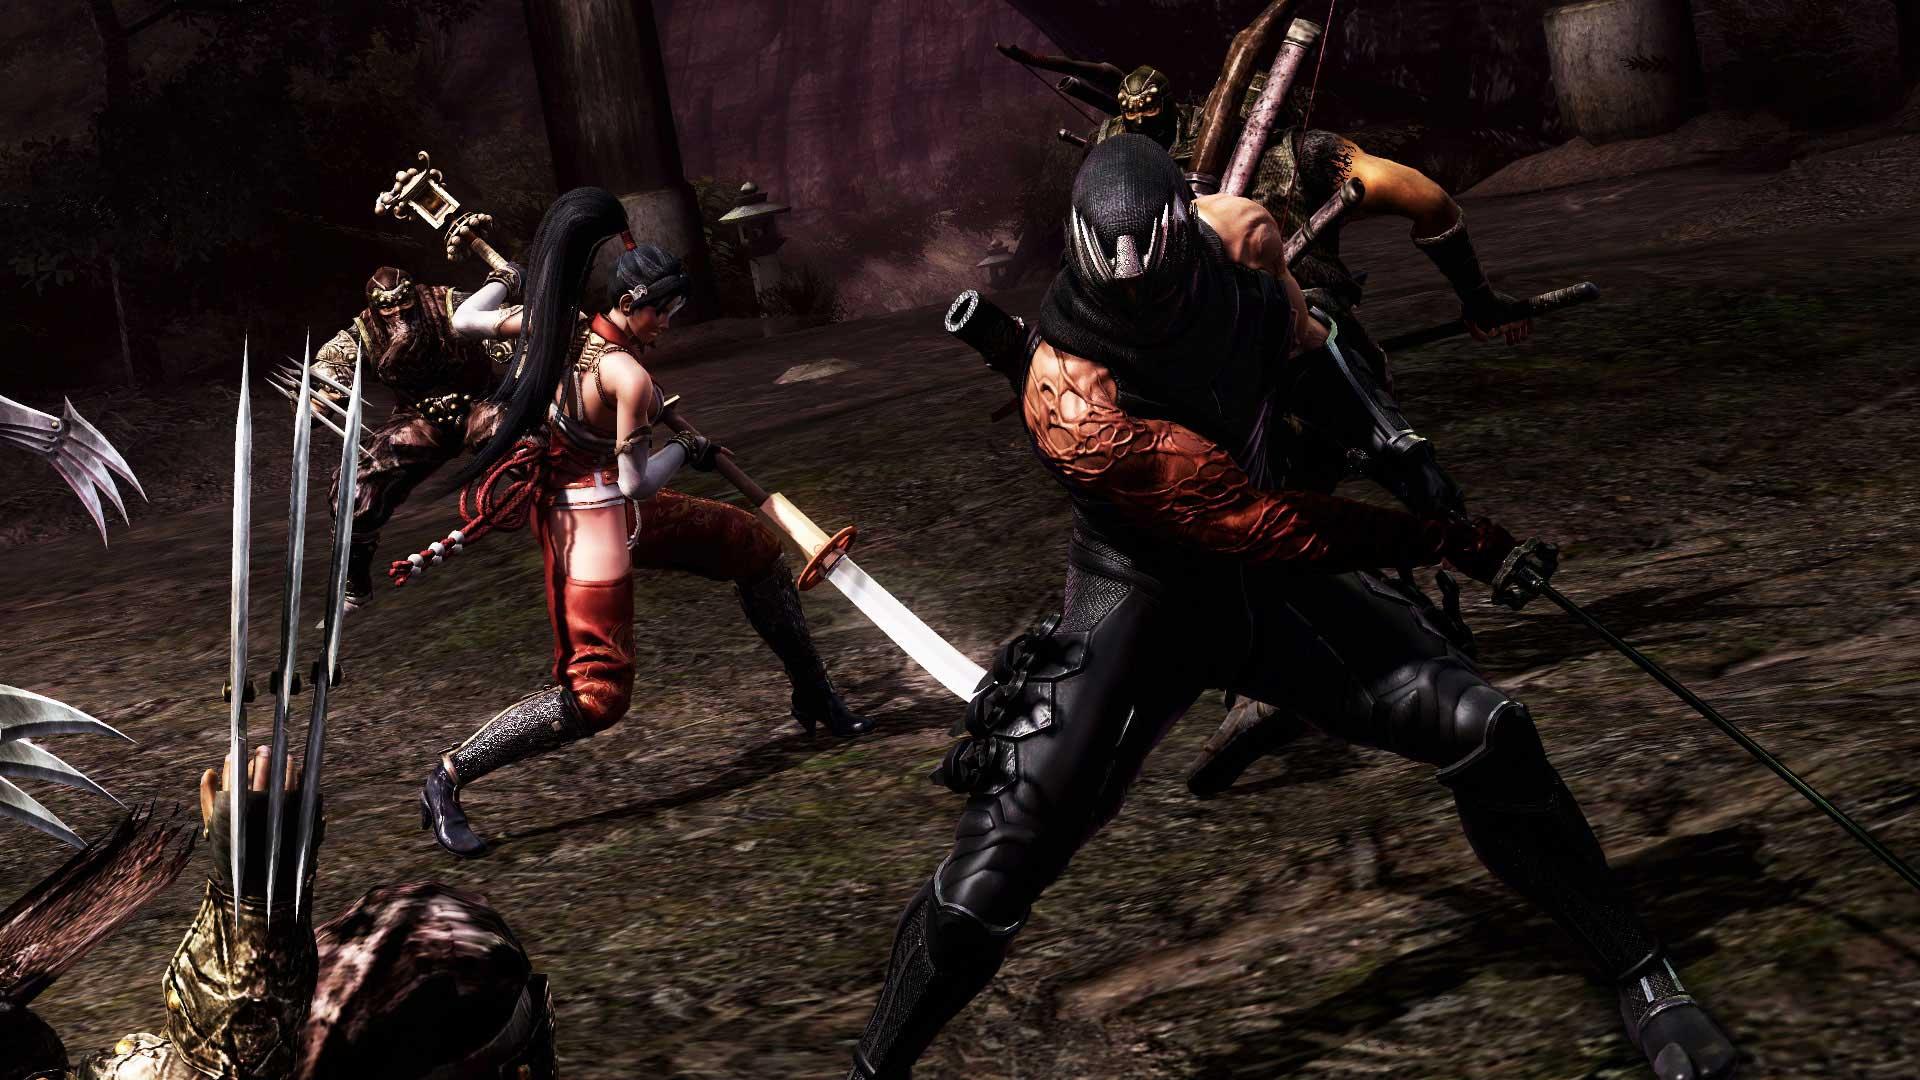 ninja gaiden 3 developer diary and seven new ps3 screenshots